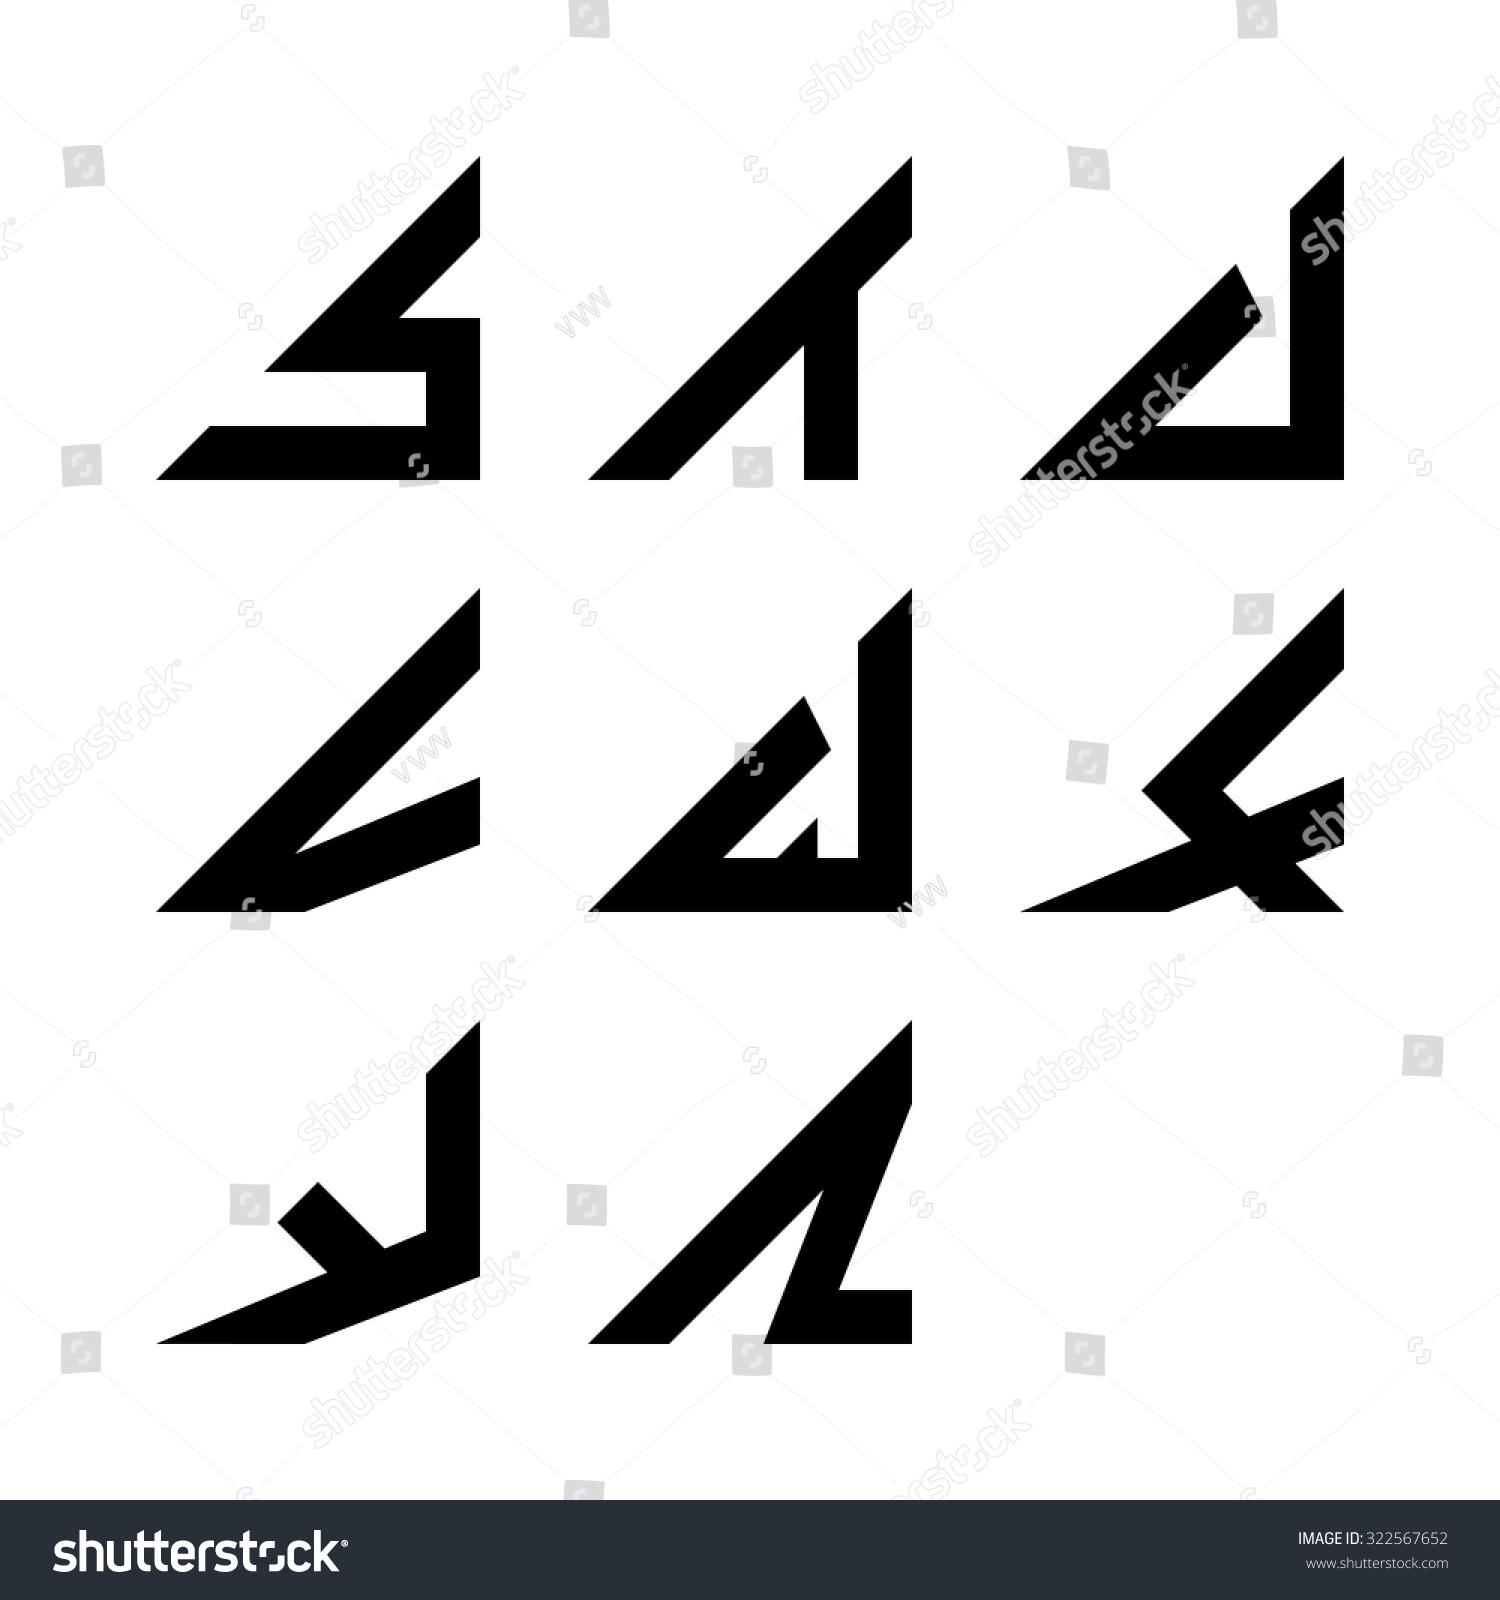 Font Where Symbols Cover The Letters Mersnoforum